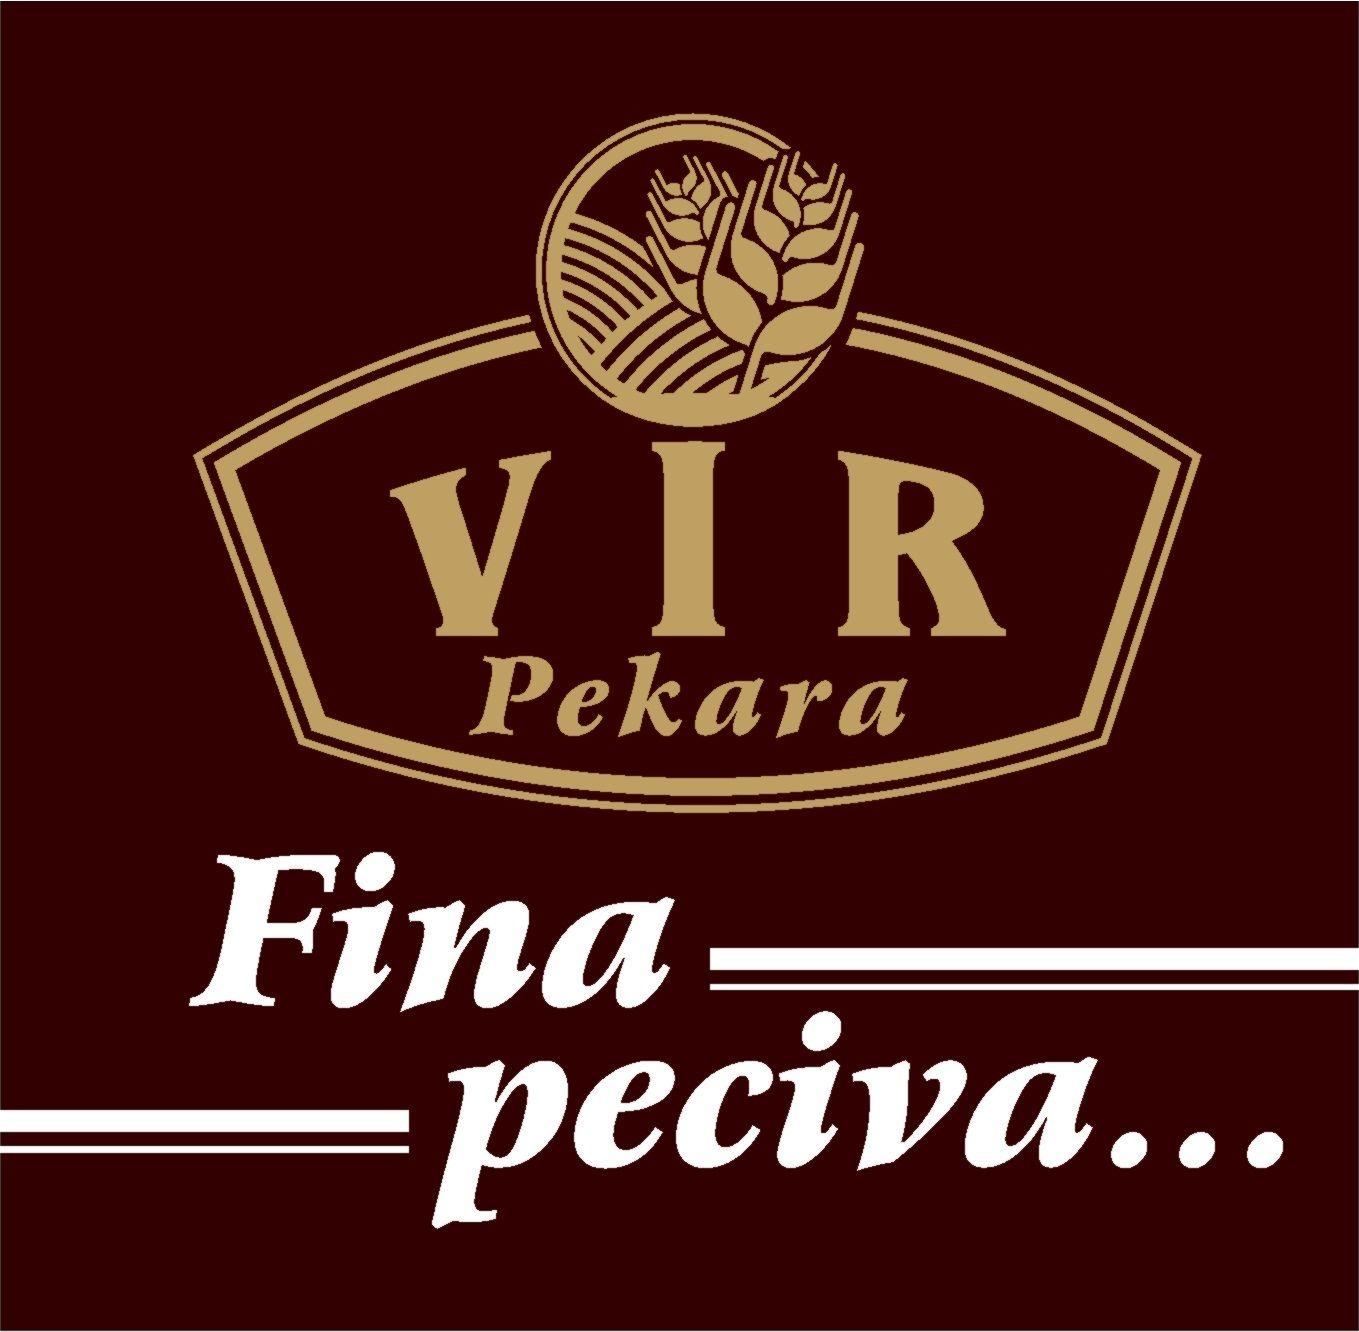 Pekara Vir